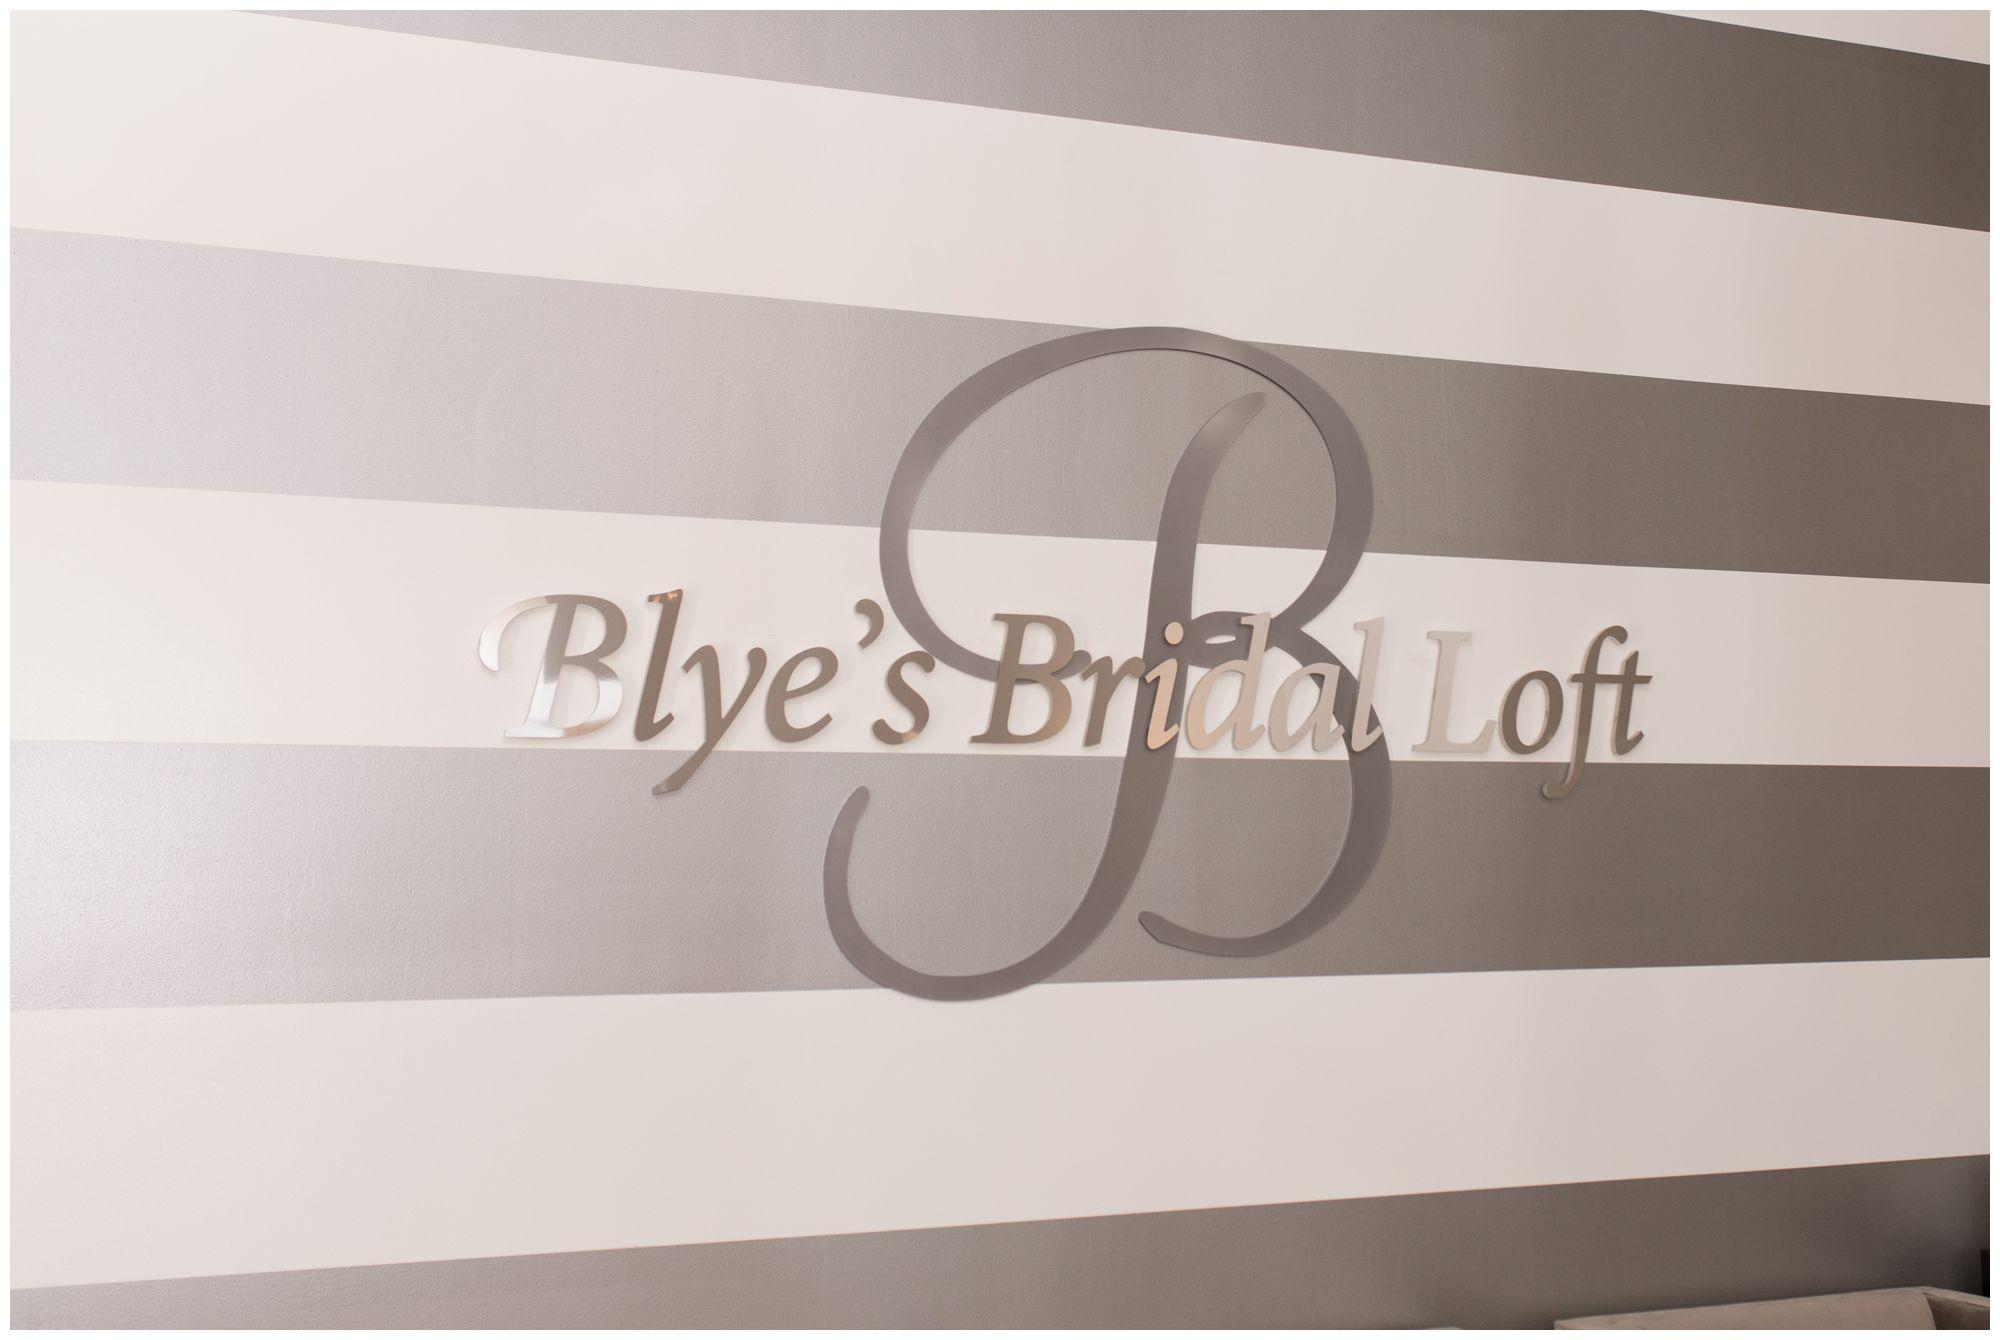 Blye's Bridal Loft in downtown Kokomo Indiana